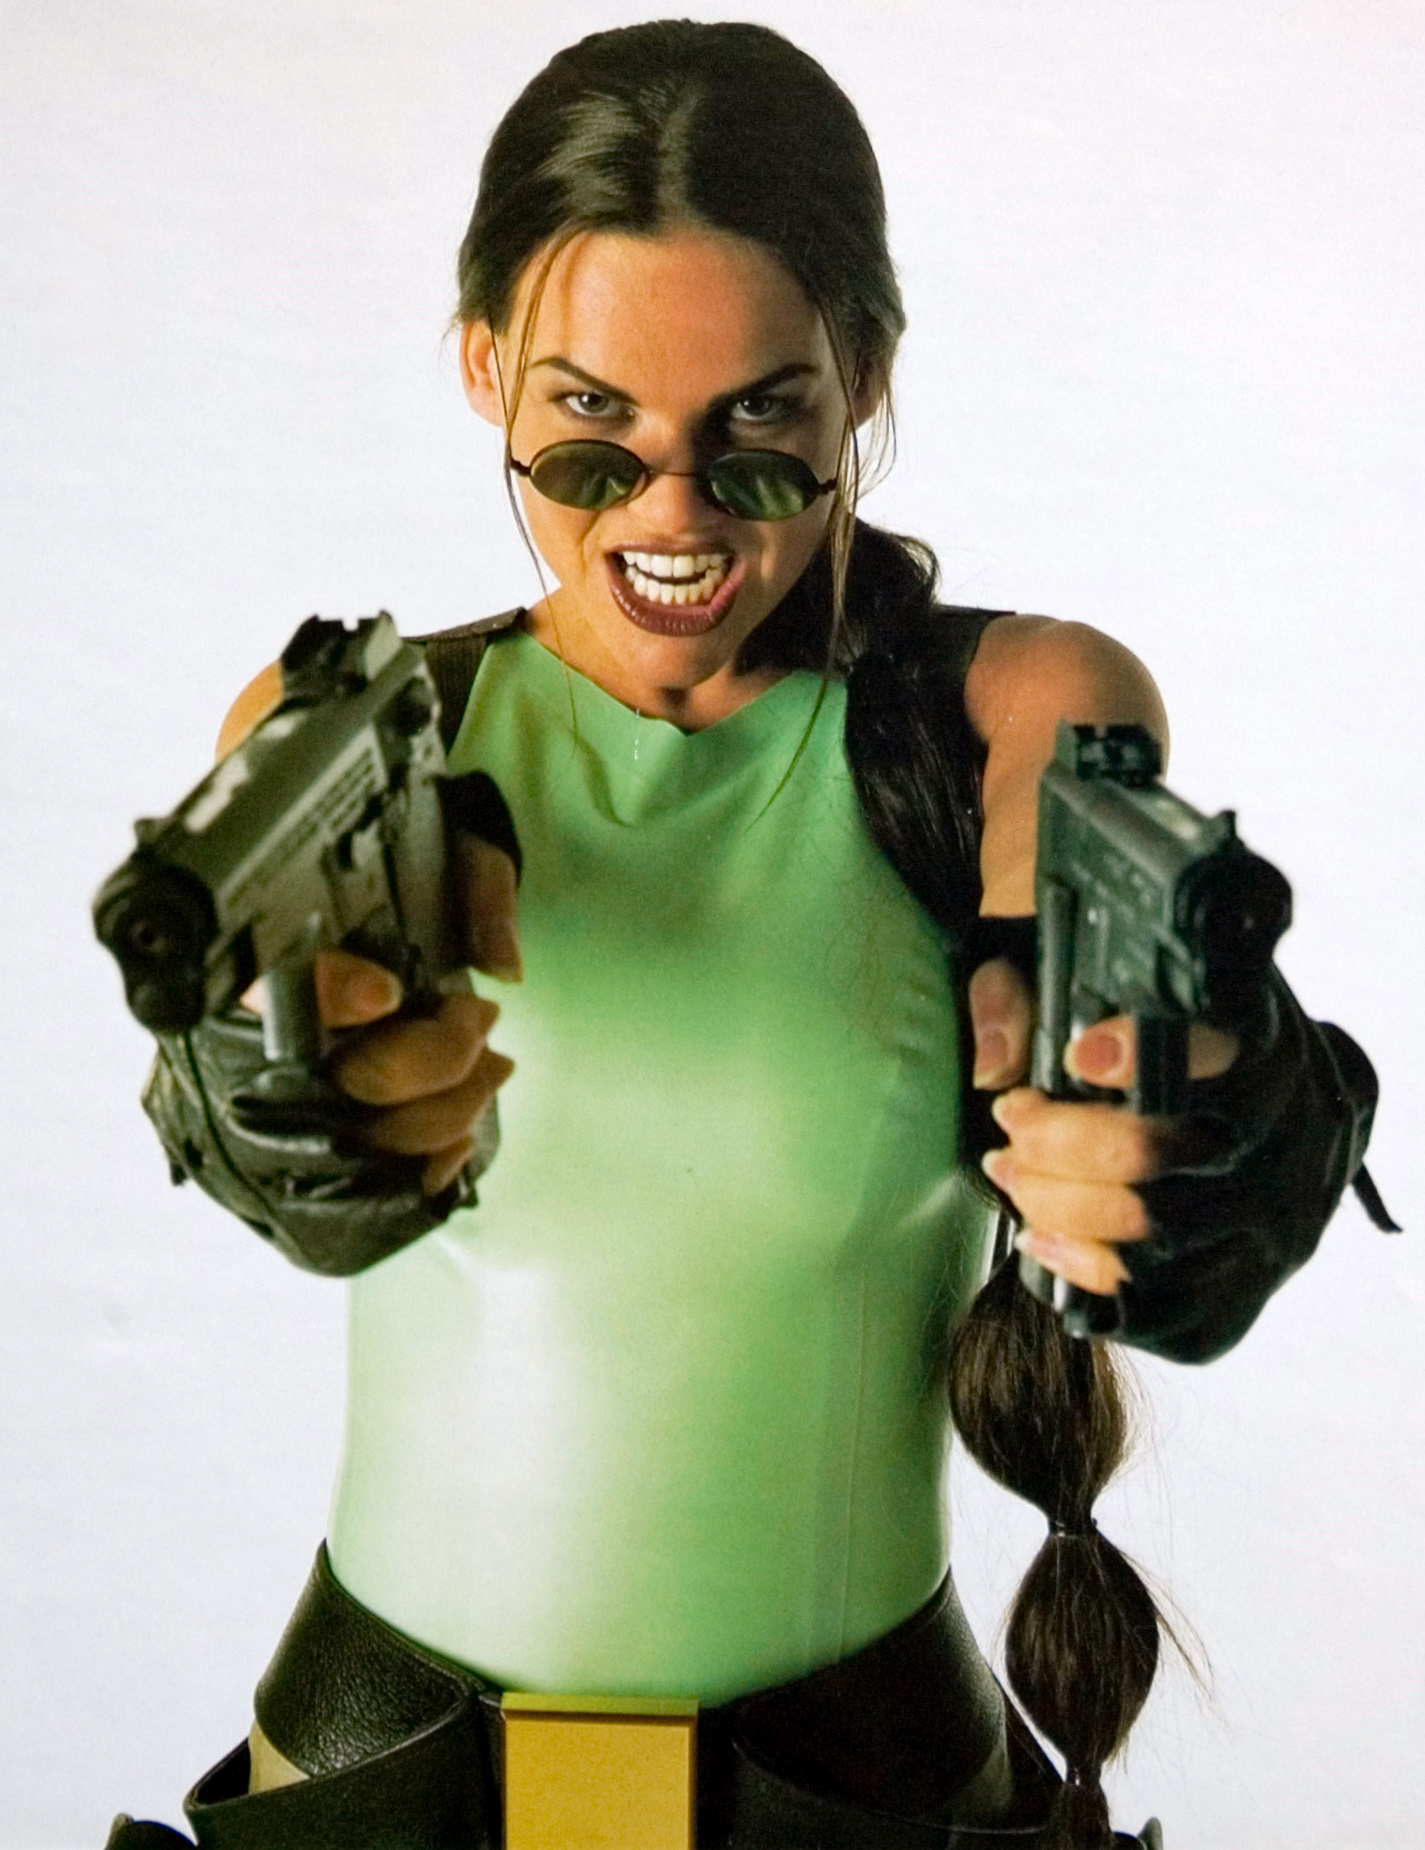 Lara Weller<br /><br />Született: 1975, Hollandia<br />Magasság: 173 cm<br />Testsúly: 64 kg<br />Szeme színe: barna<br />Haja színe: barna<br />Méretek: 86-61-86